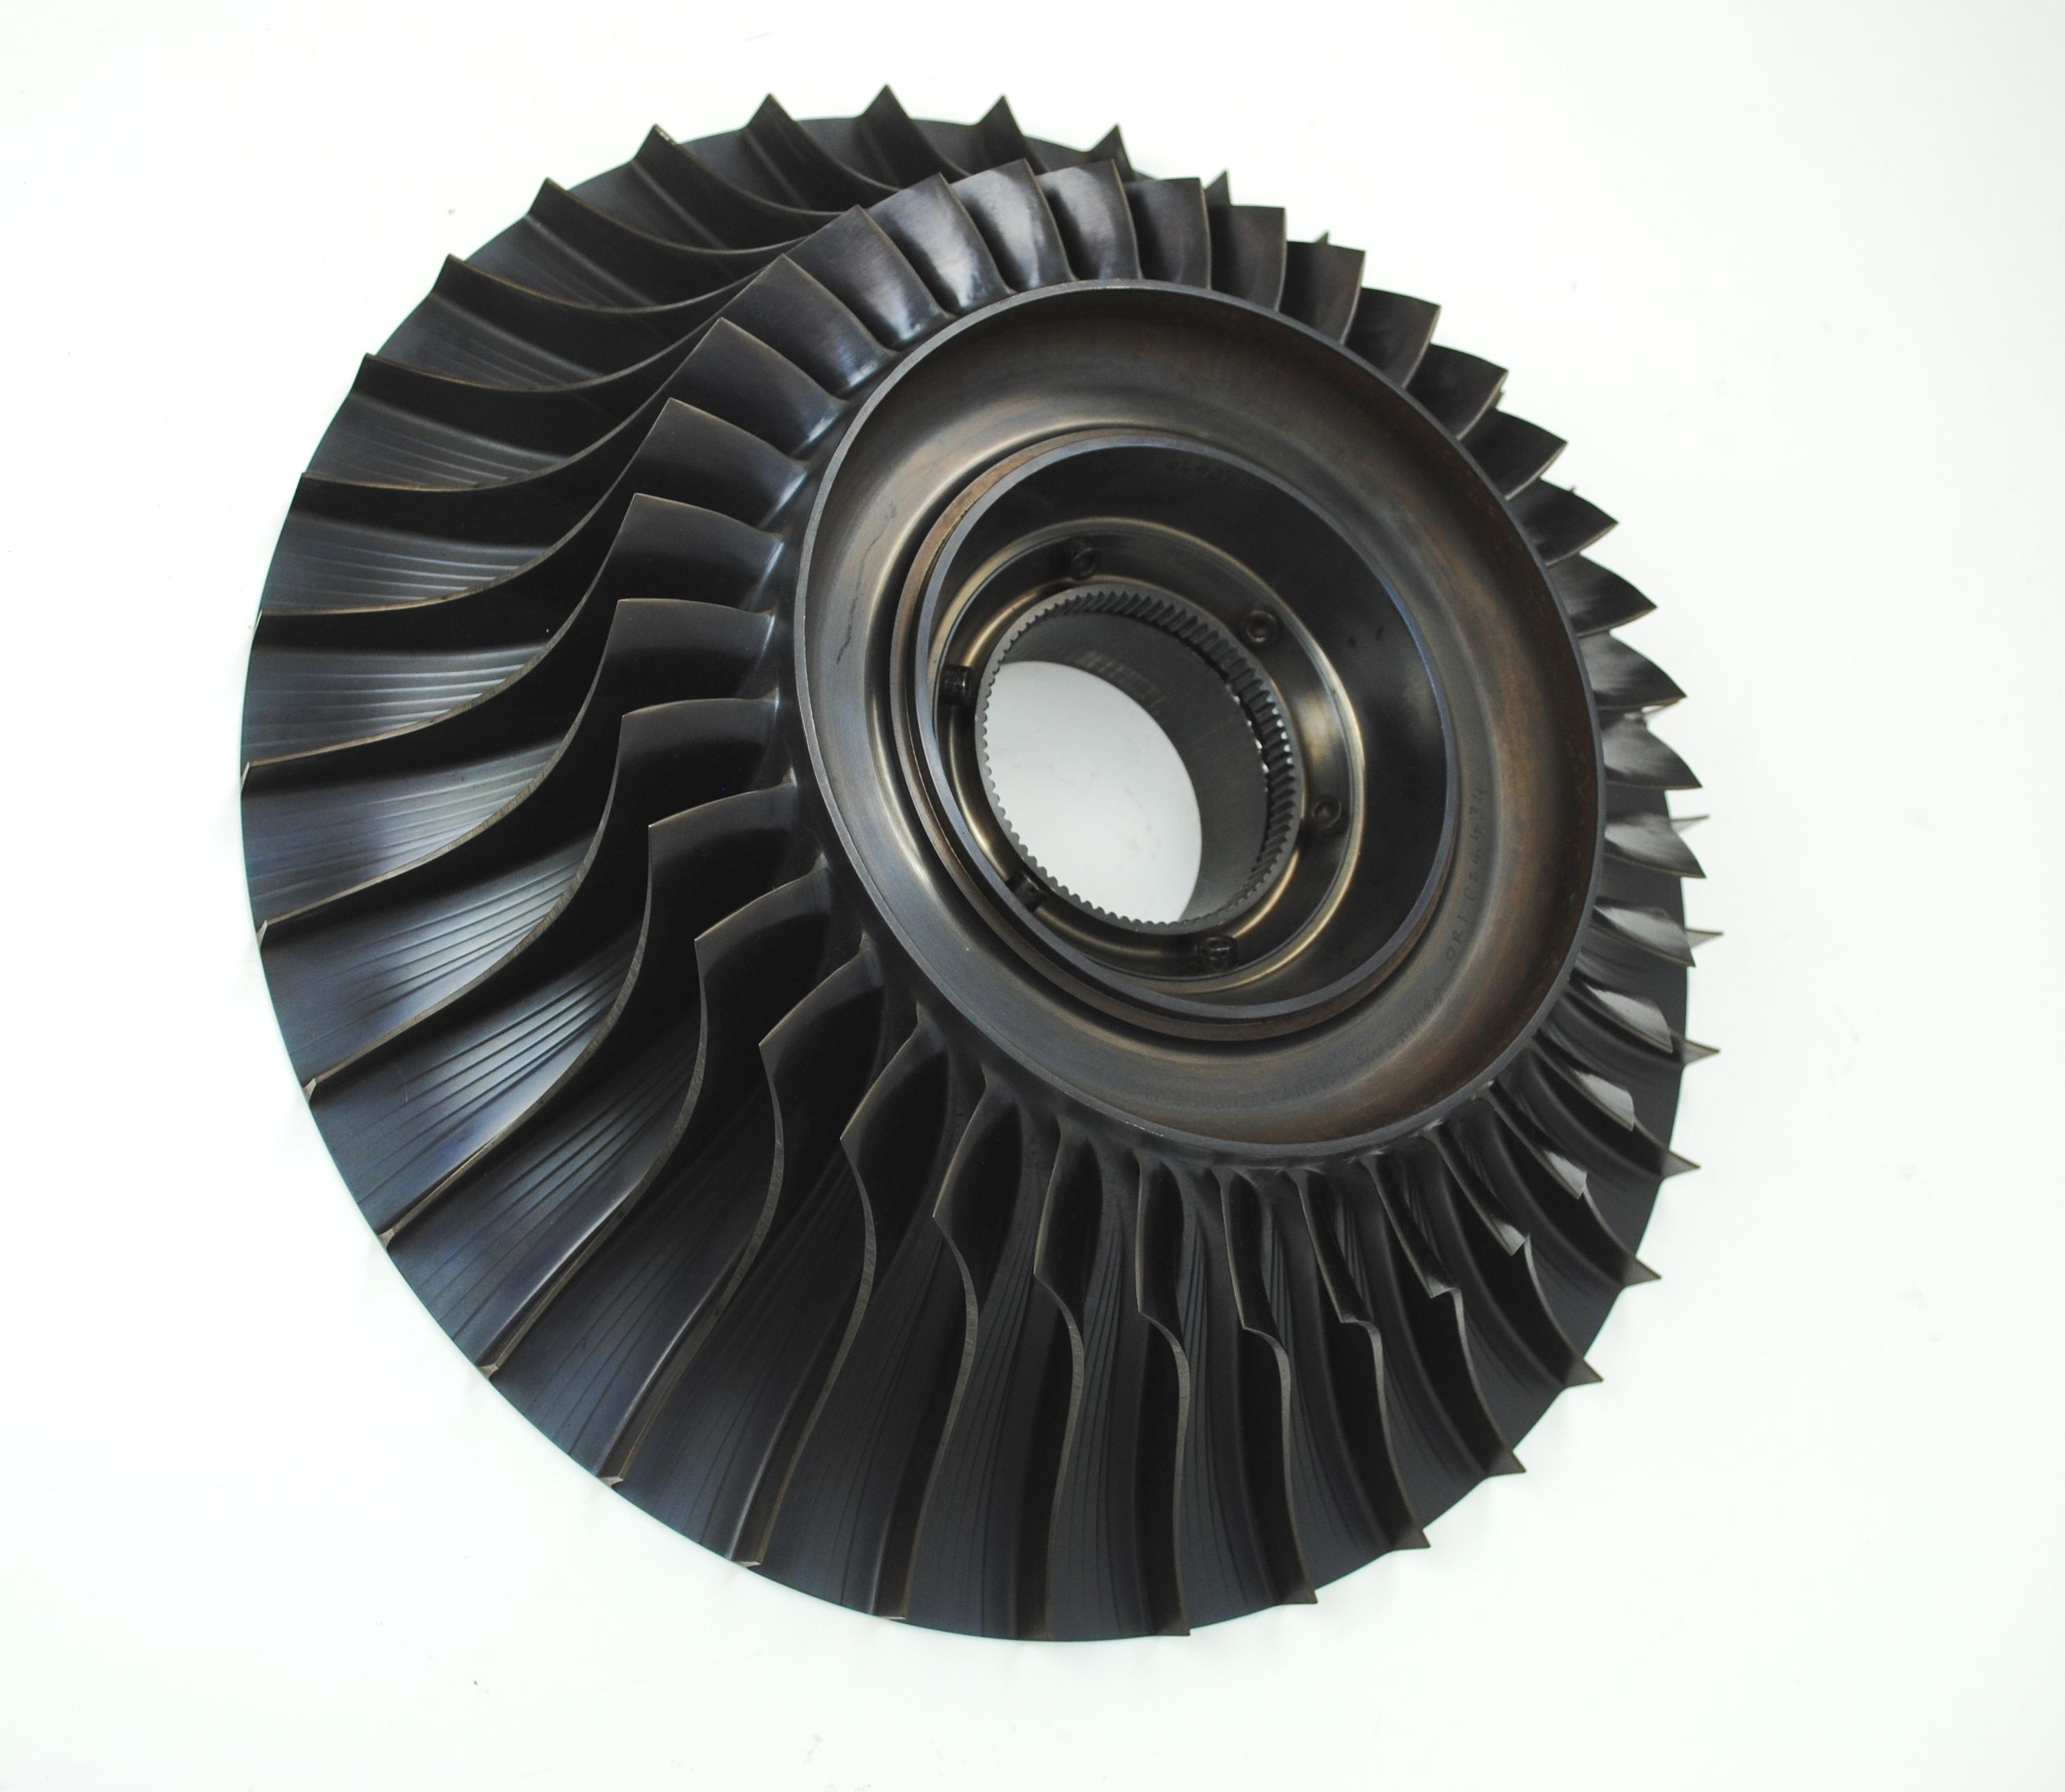 jet engine impeller